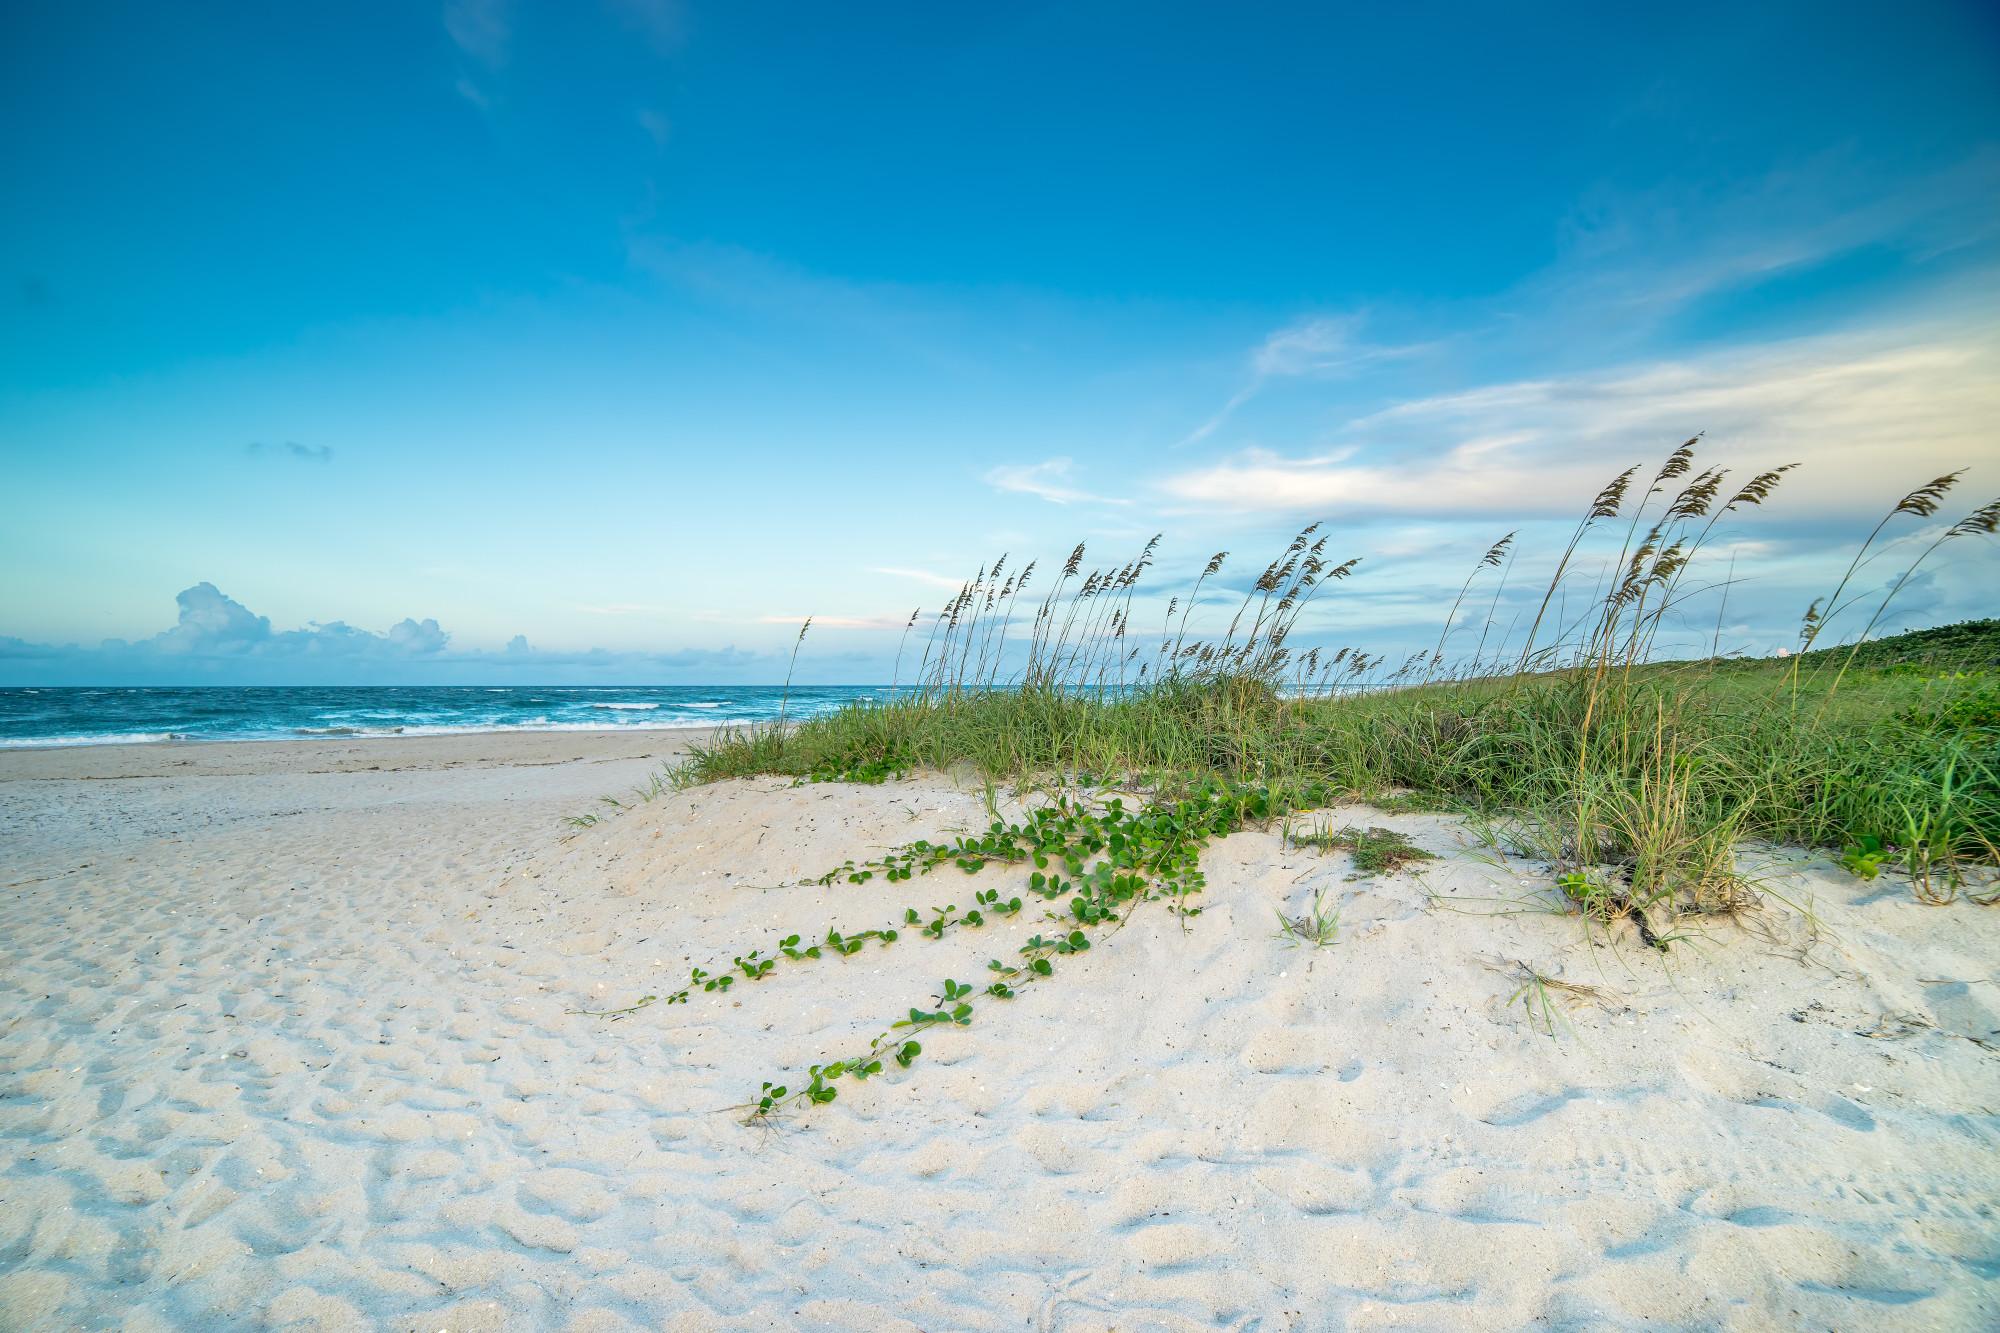 vero beach hotels map with Visitindianrivercounty on 20272 moreover Summerland Key as well Karte von fort lauderdale region 7 512 moreover Cheap Flights To Vero Beach d6023660 additionally Disney Star Wars Resort.